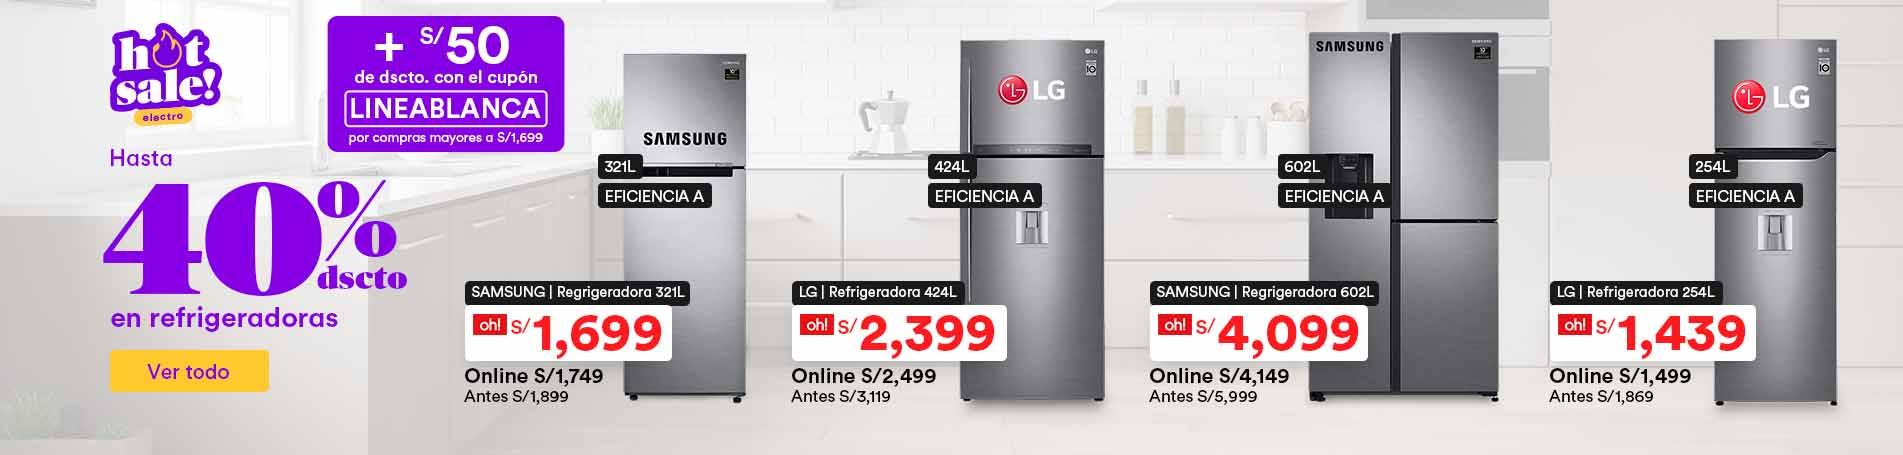 Hasta 40% dsct. en refrigeradoras